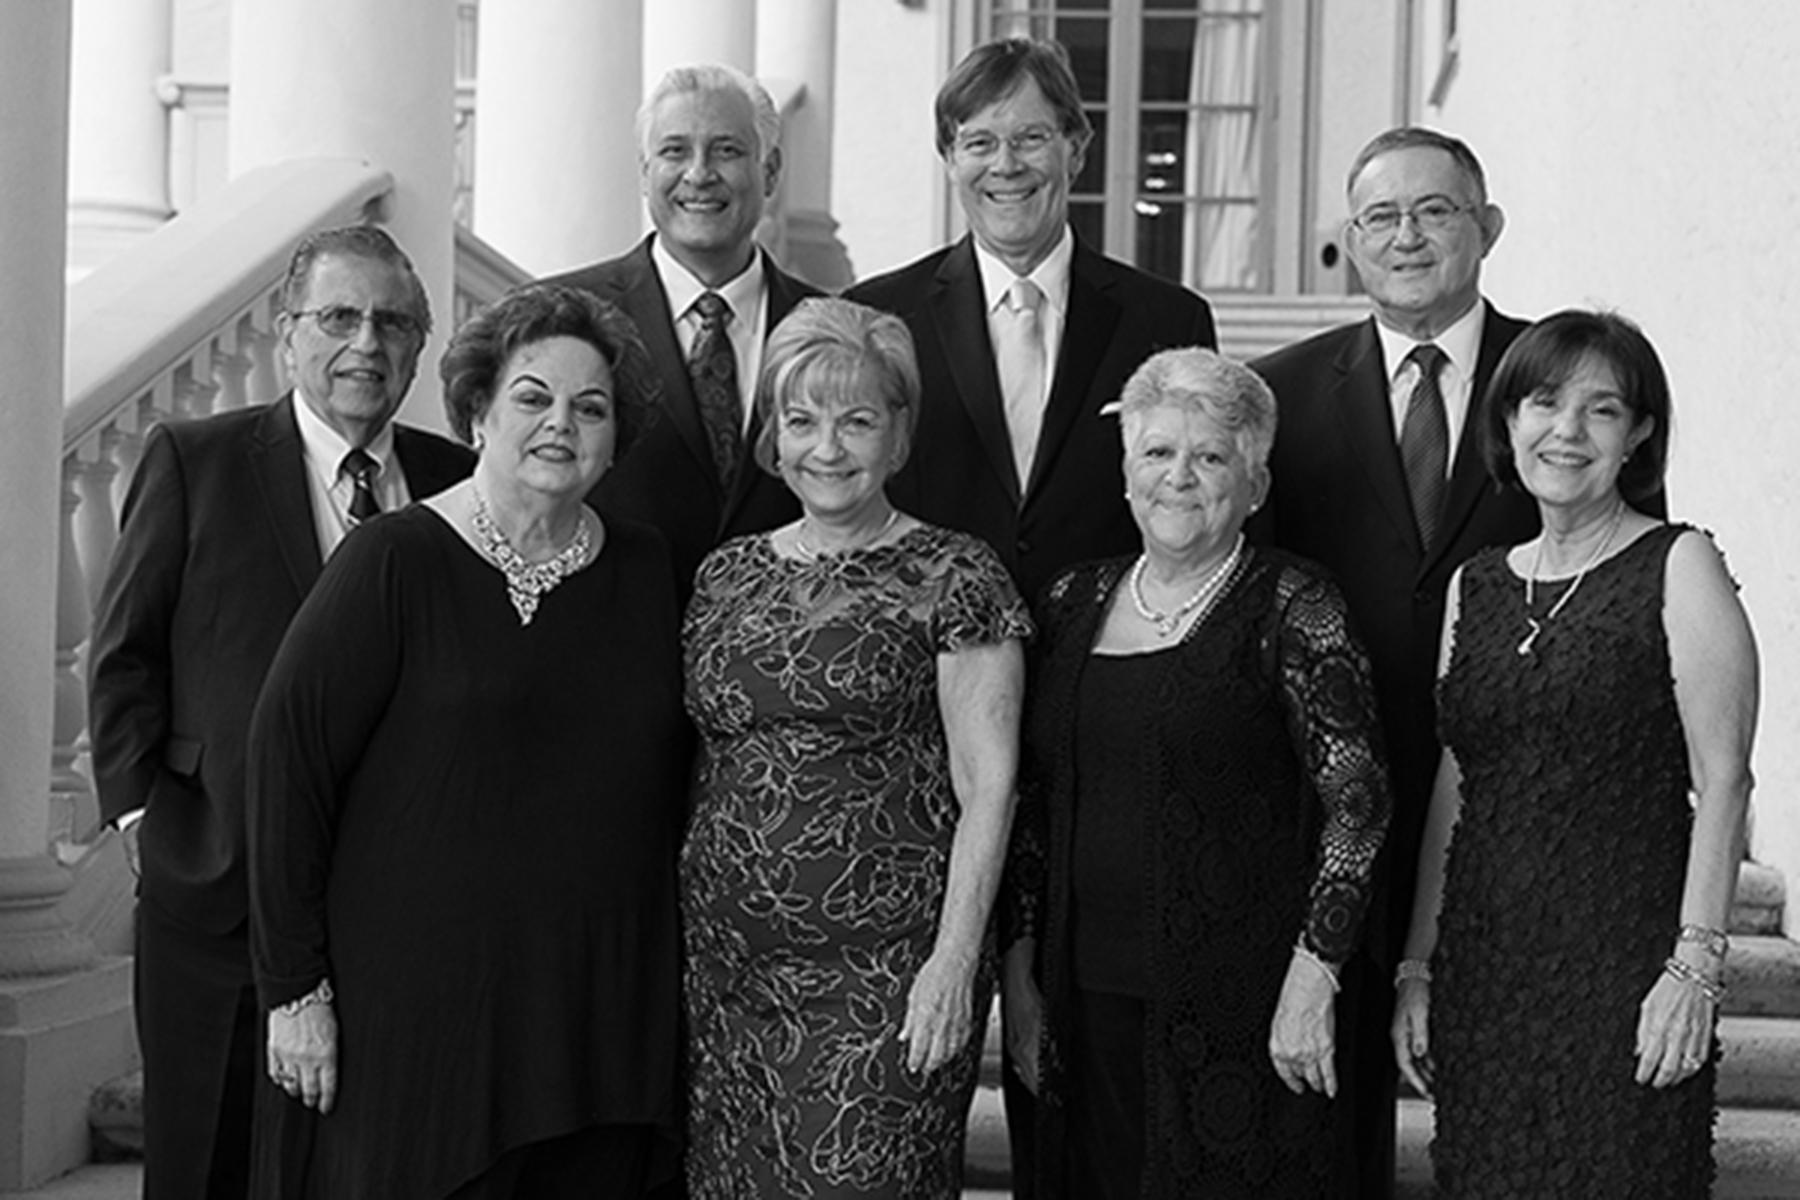 Pedro Pan's Board of Directors photo